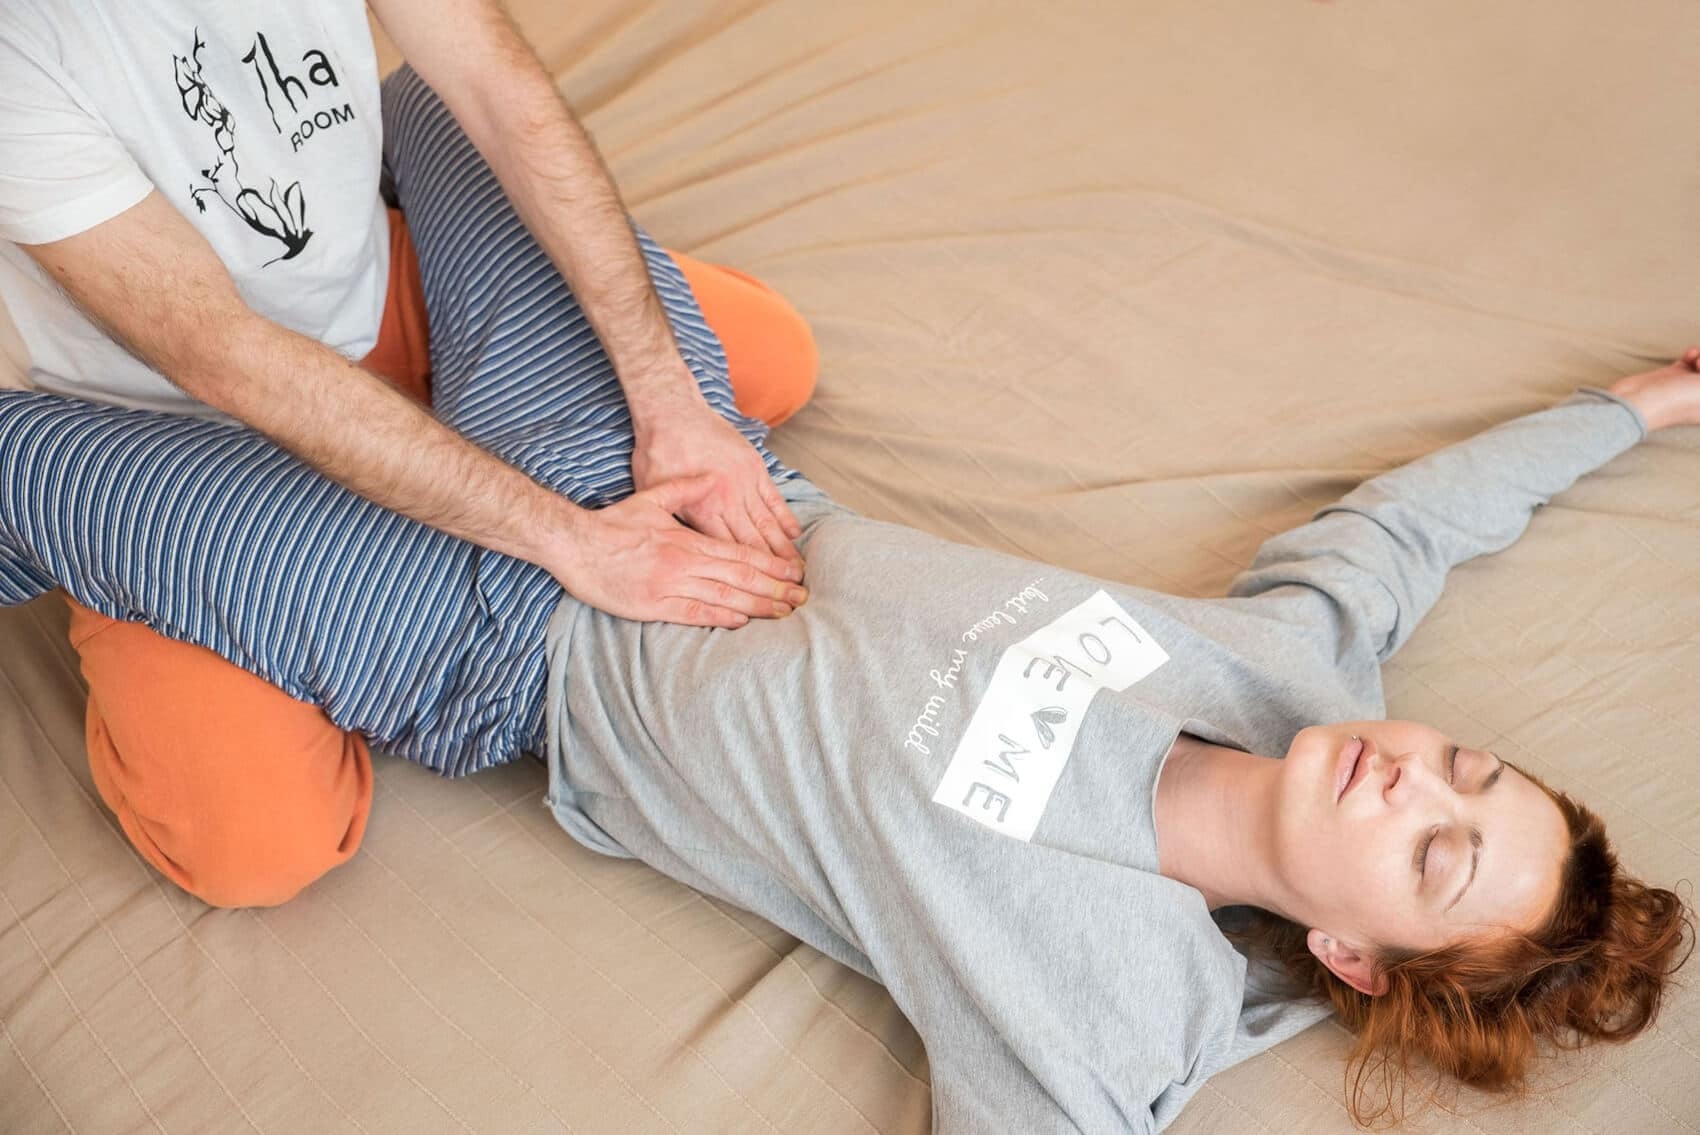 masaža abdomena tajlandska masaža u zagrebu